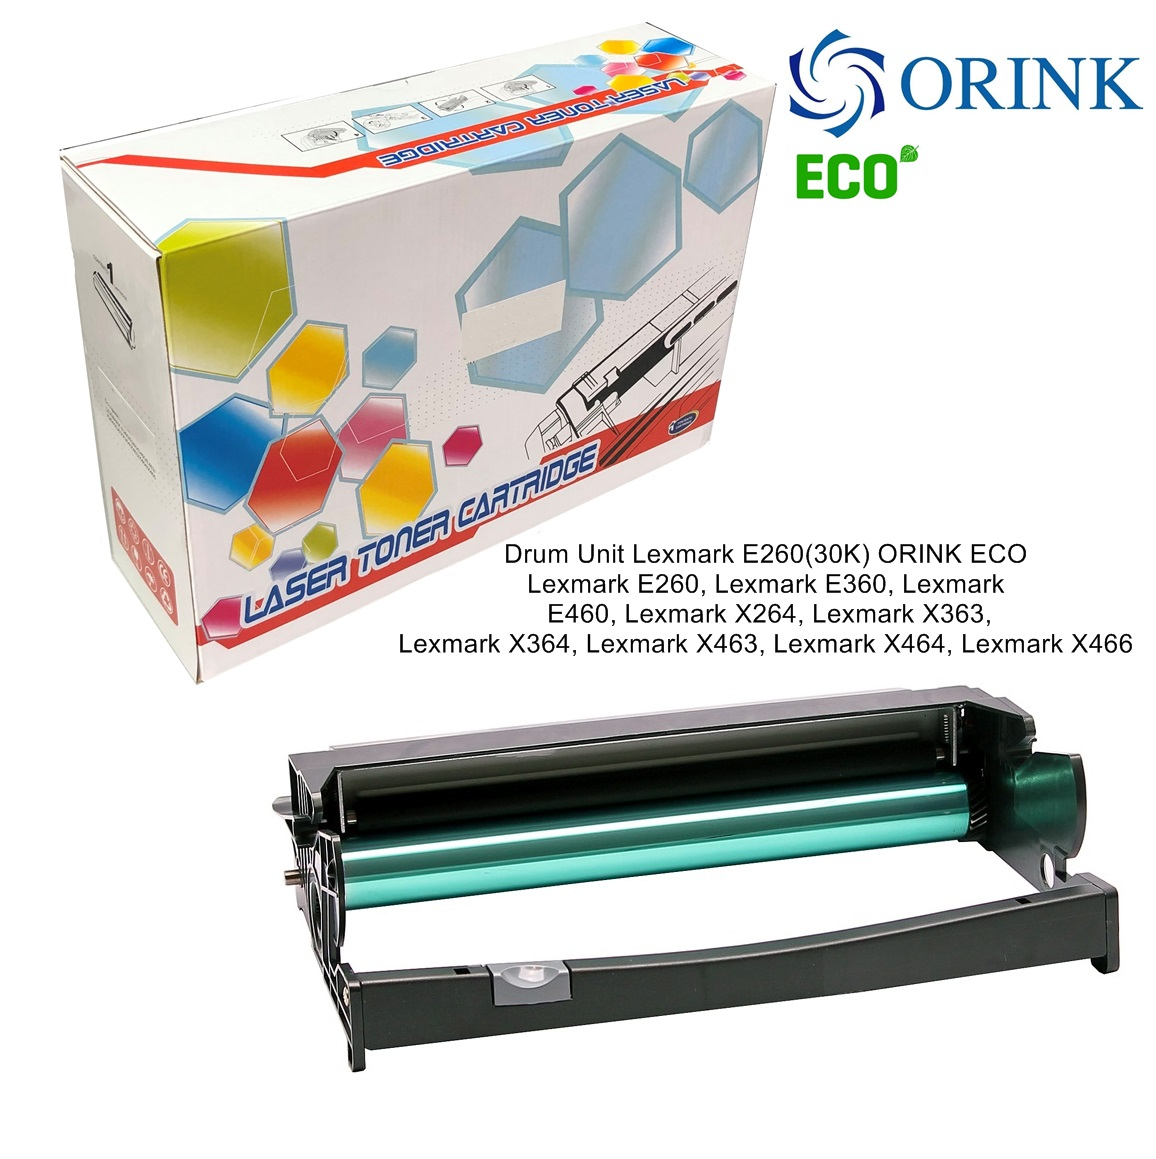 Drum Unit Lexmark E260(30K) ORINK ECO